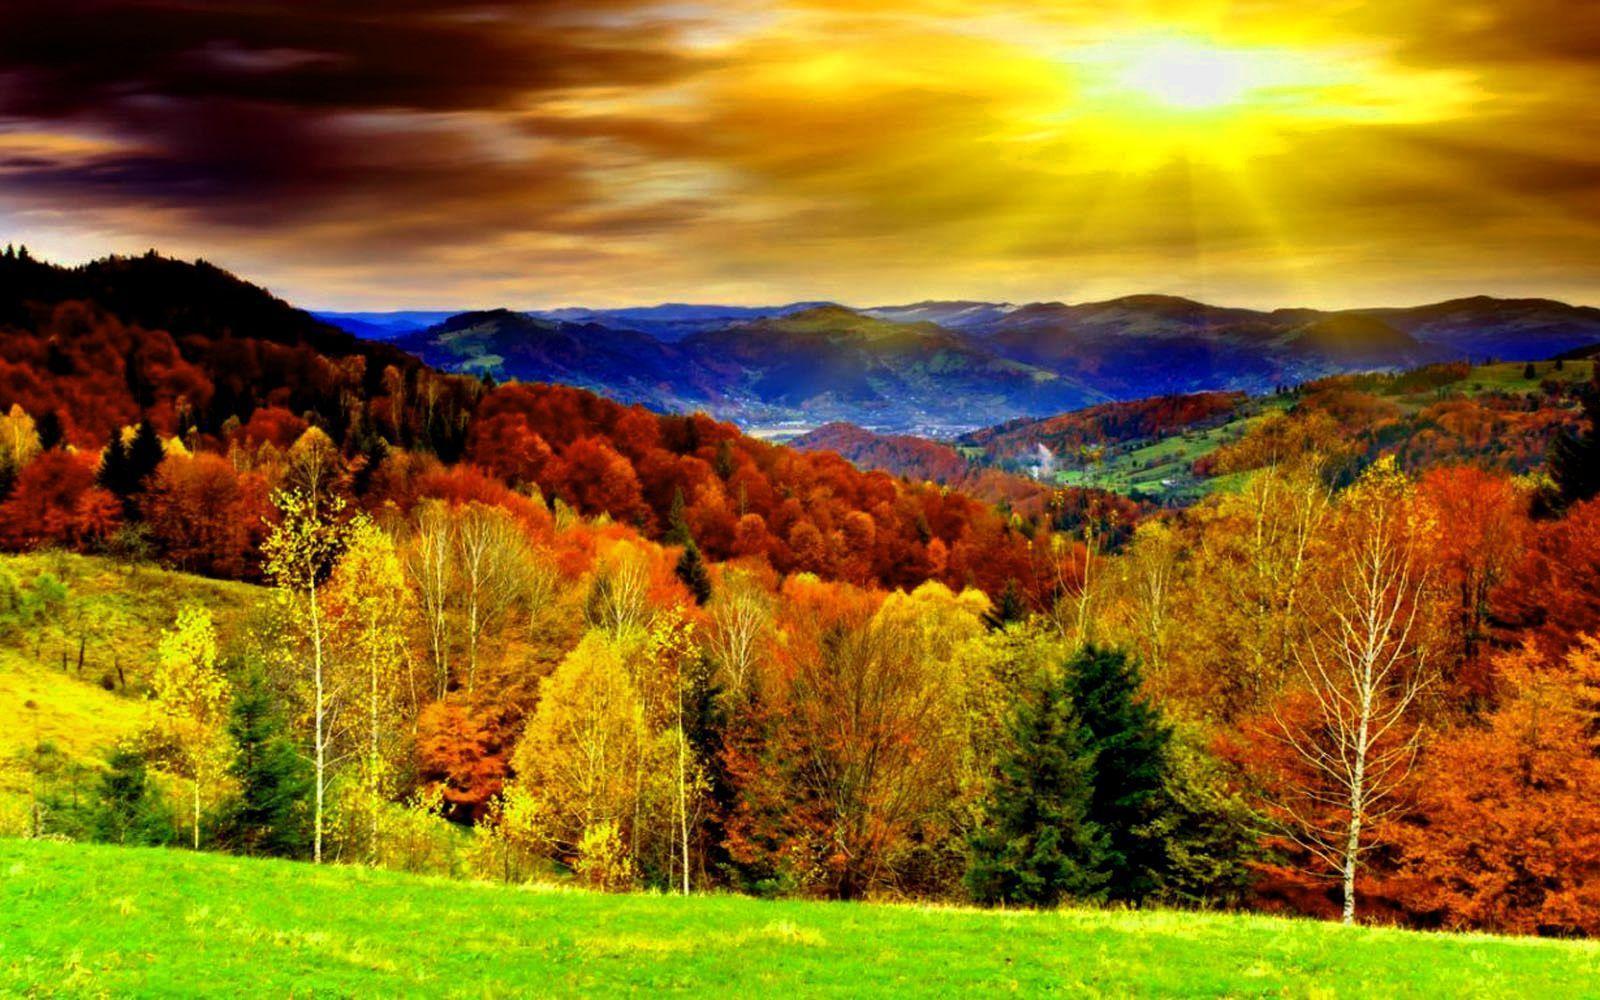 Fall Desktop Wallpapers - Top Free Fall Desktop ...